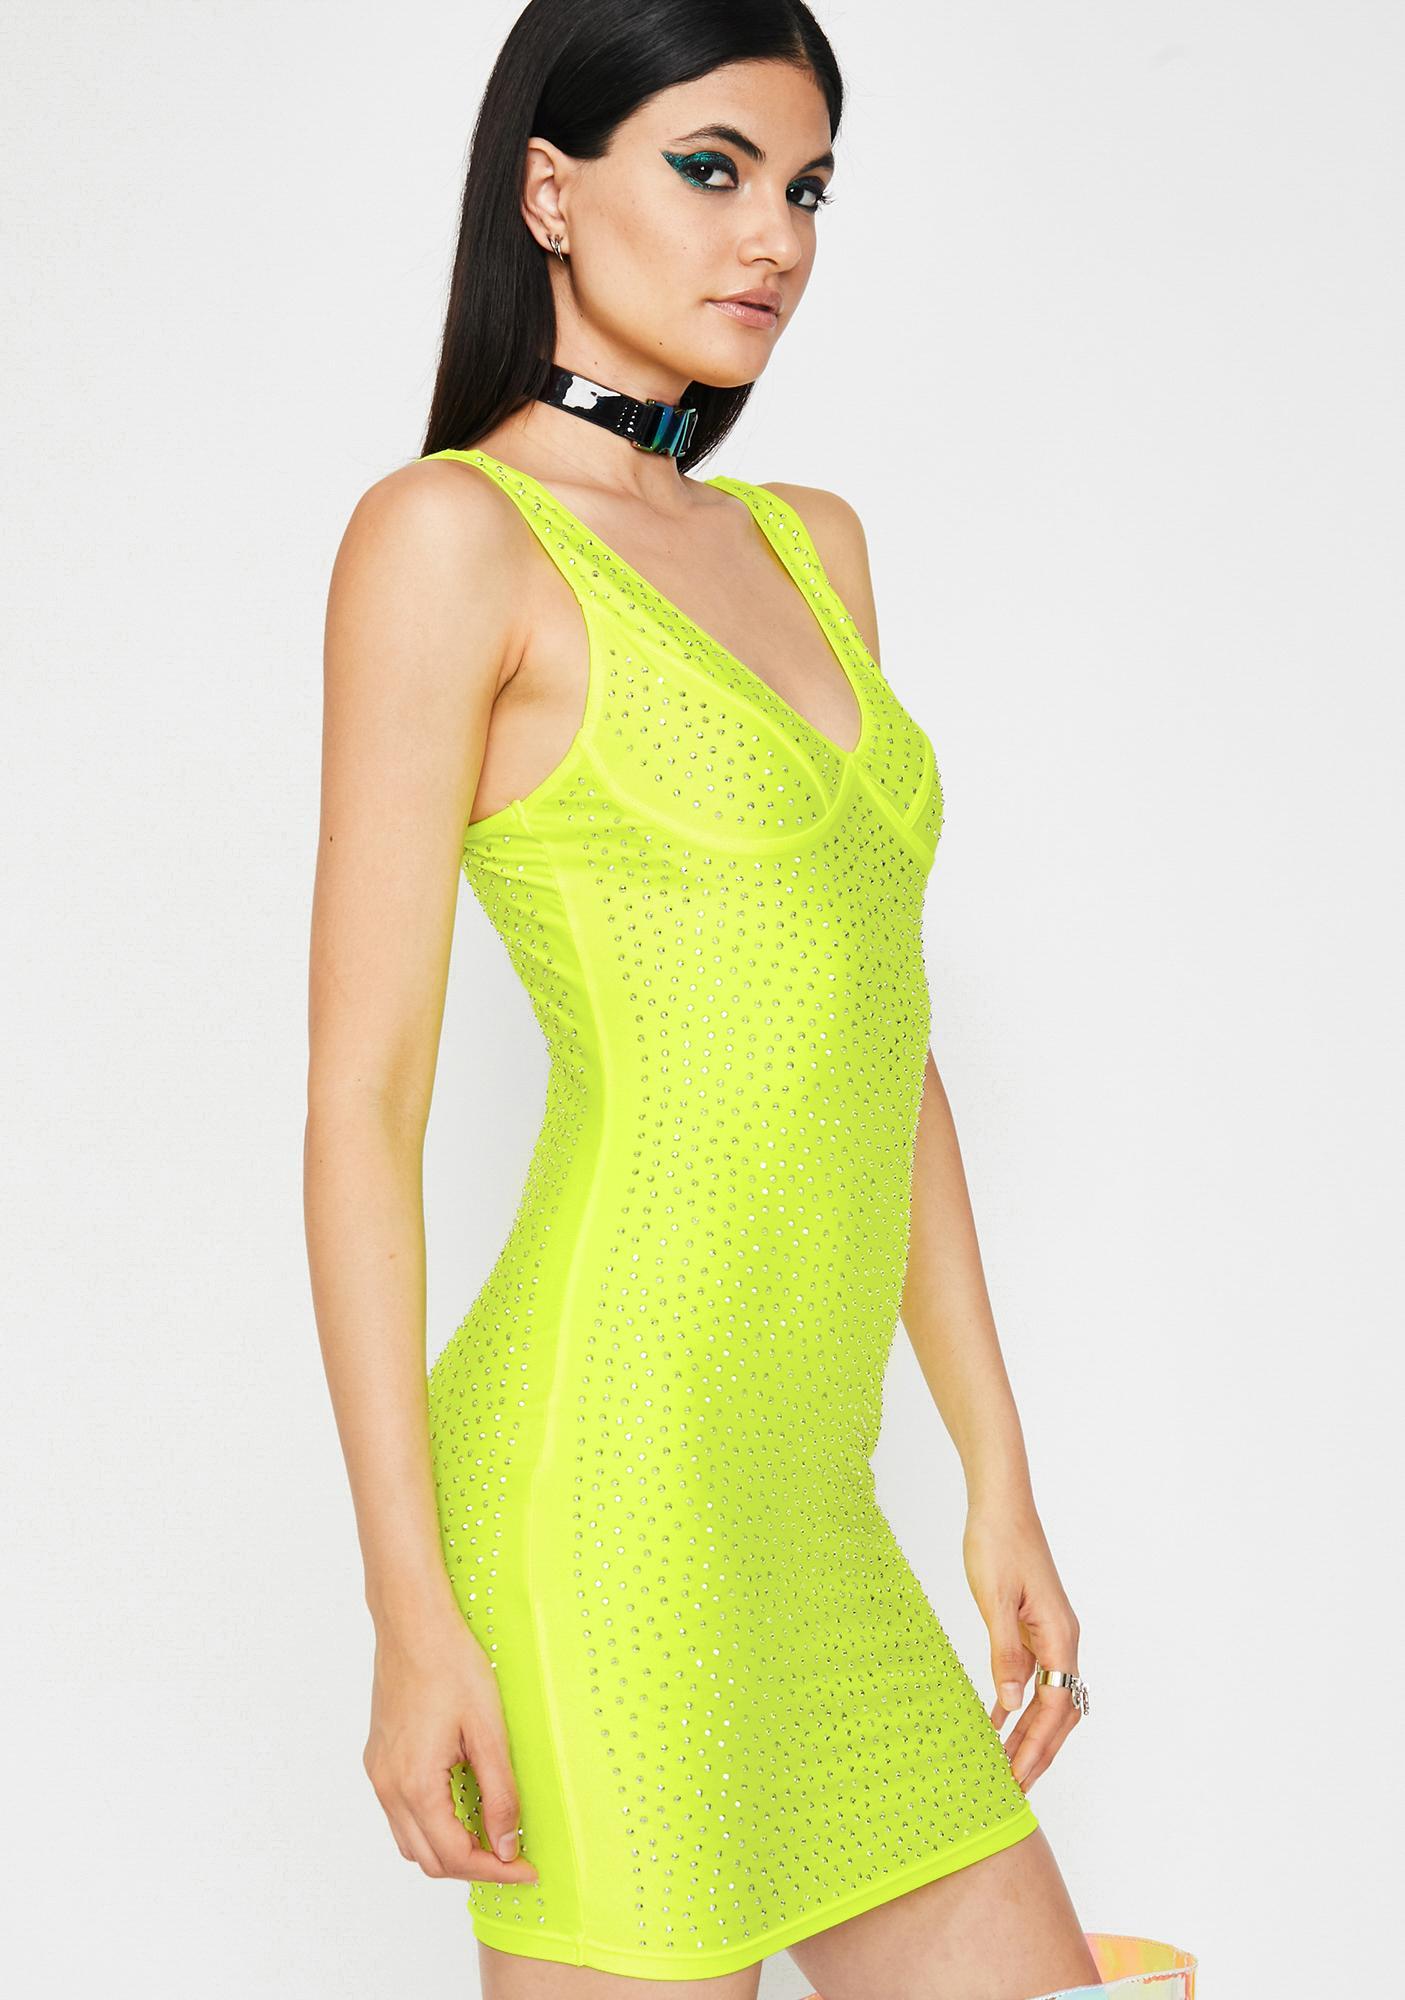 Galactic Glare Rhinestone Dress